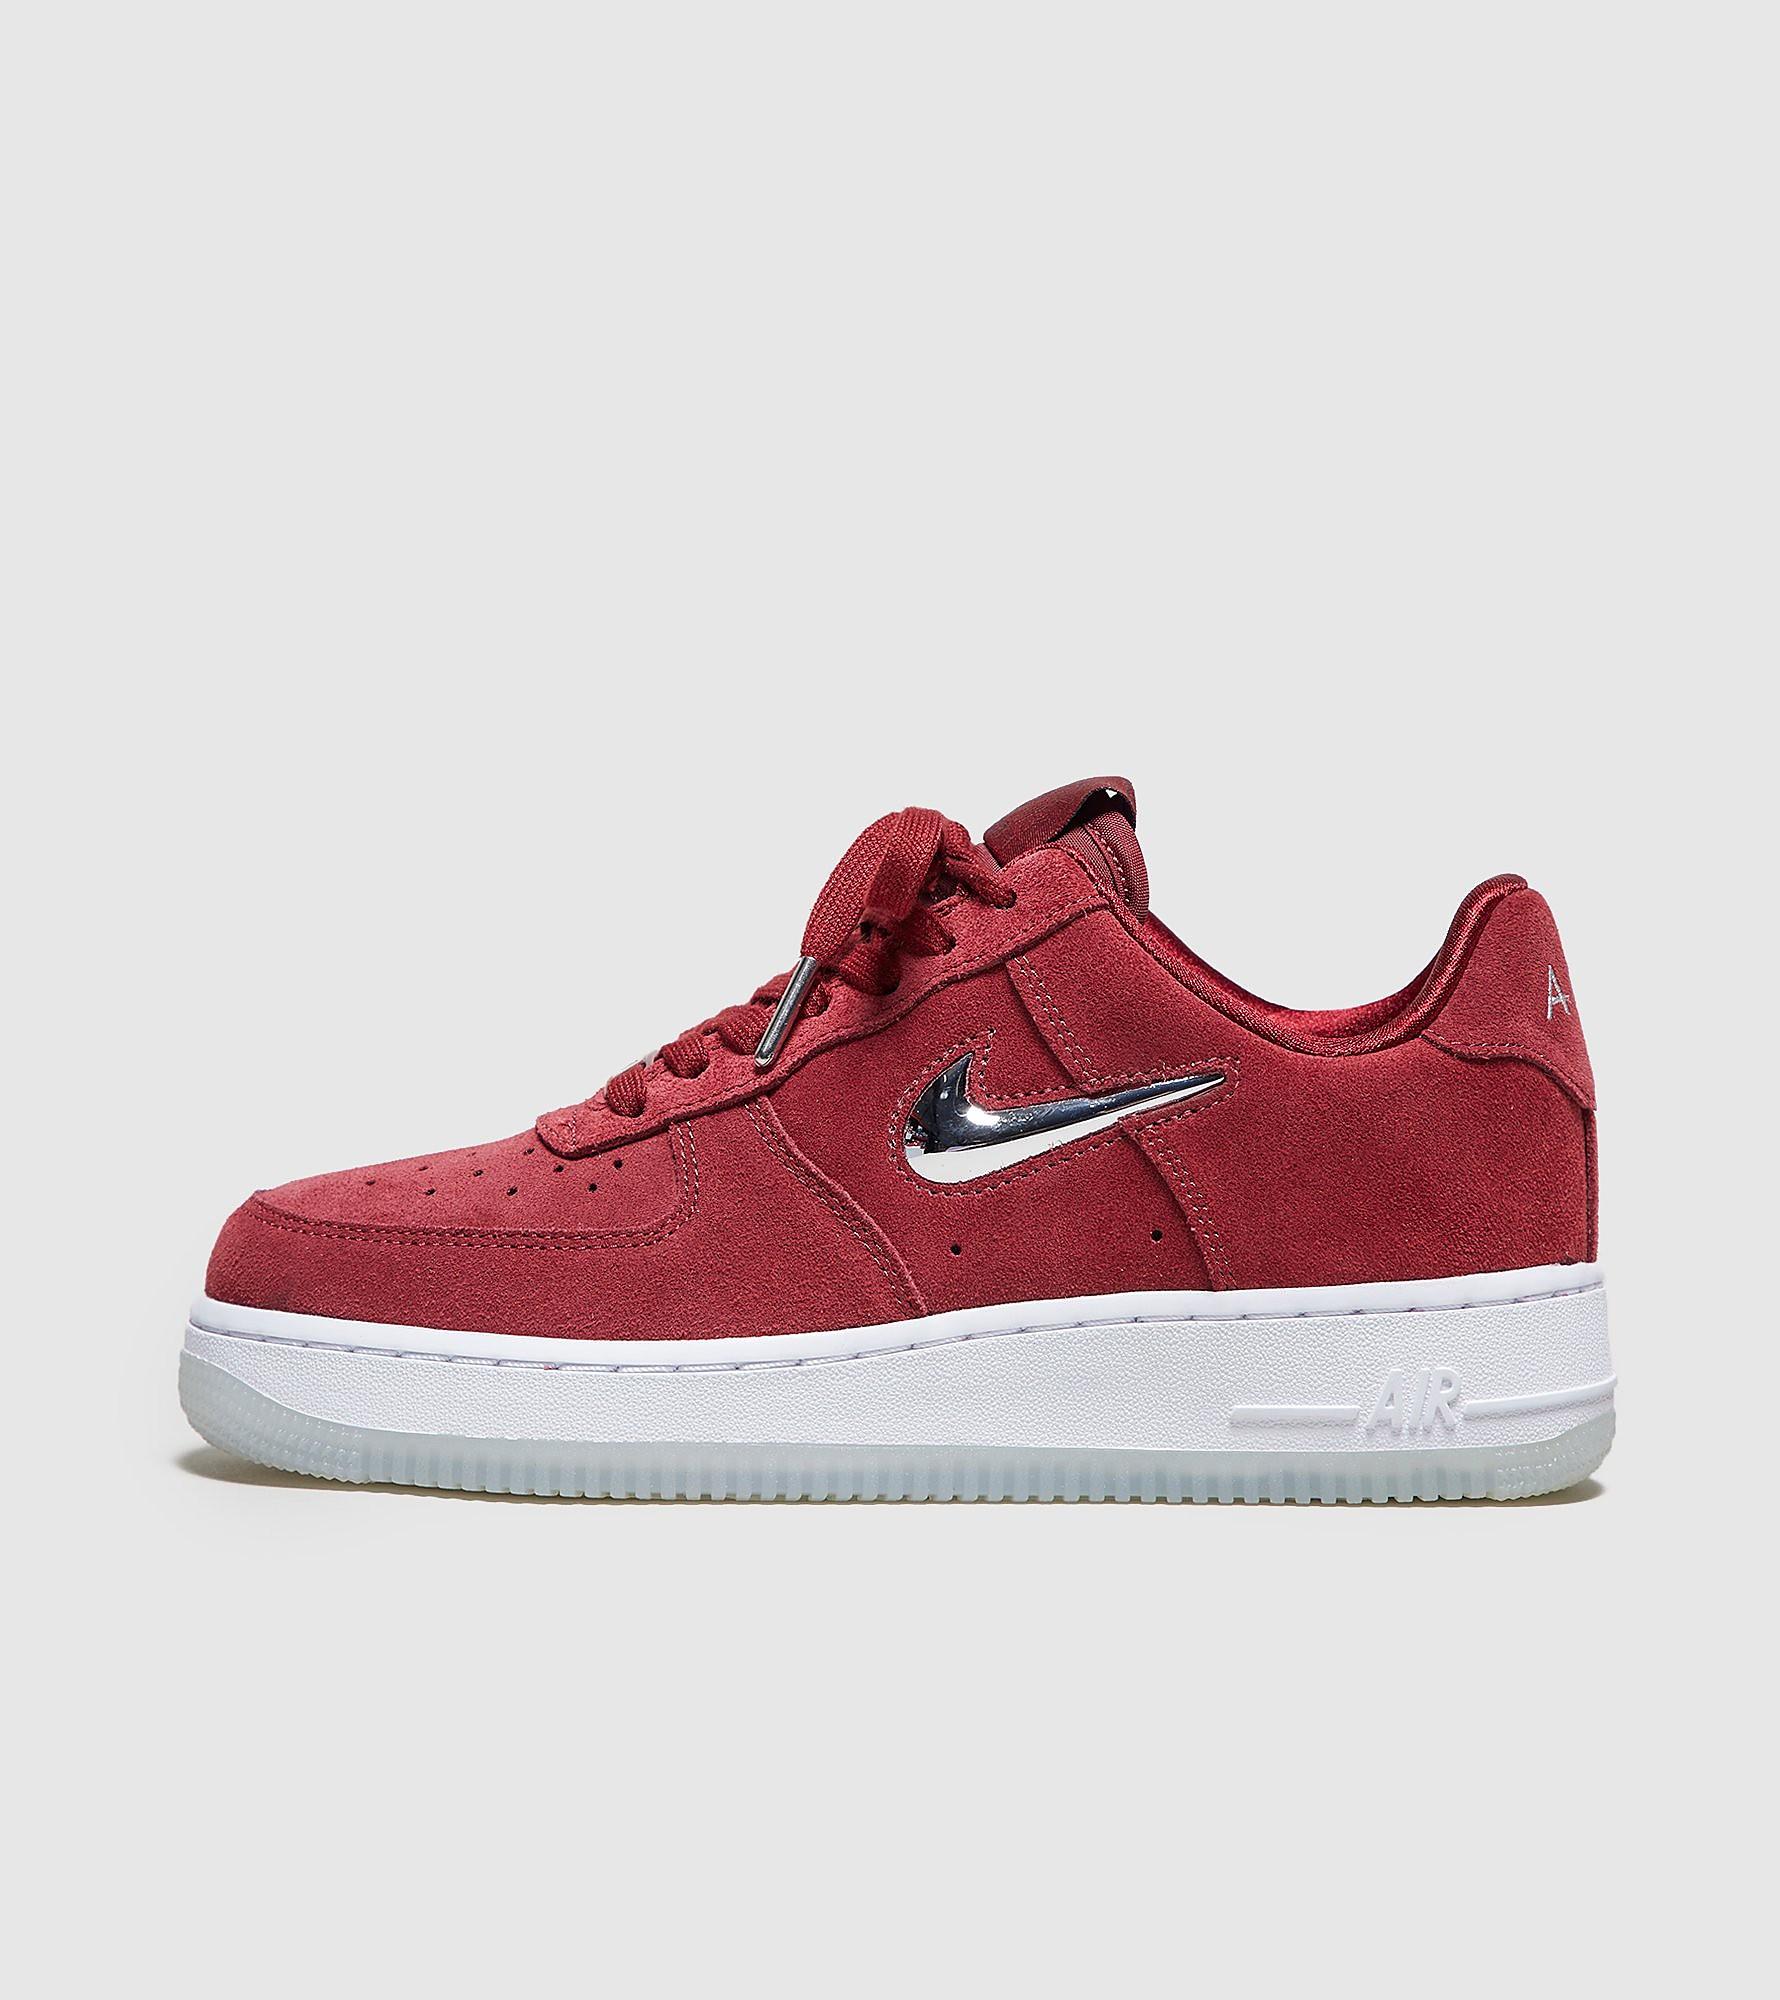 Nike Air Force 1 Jewel Low Women's